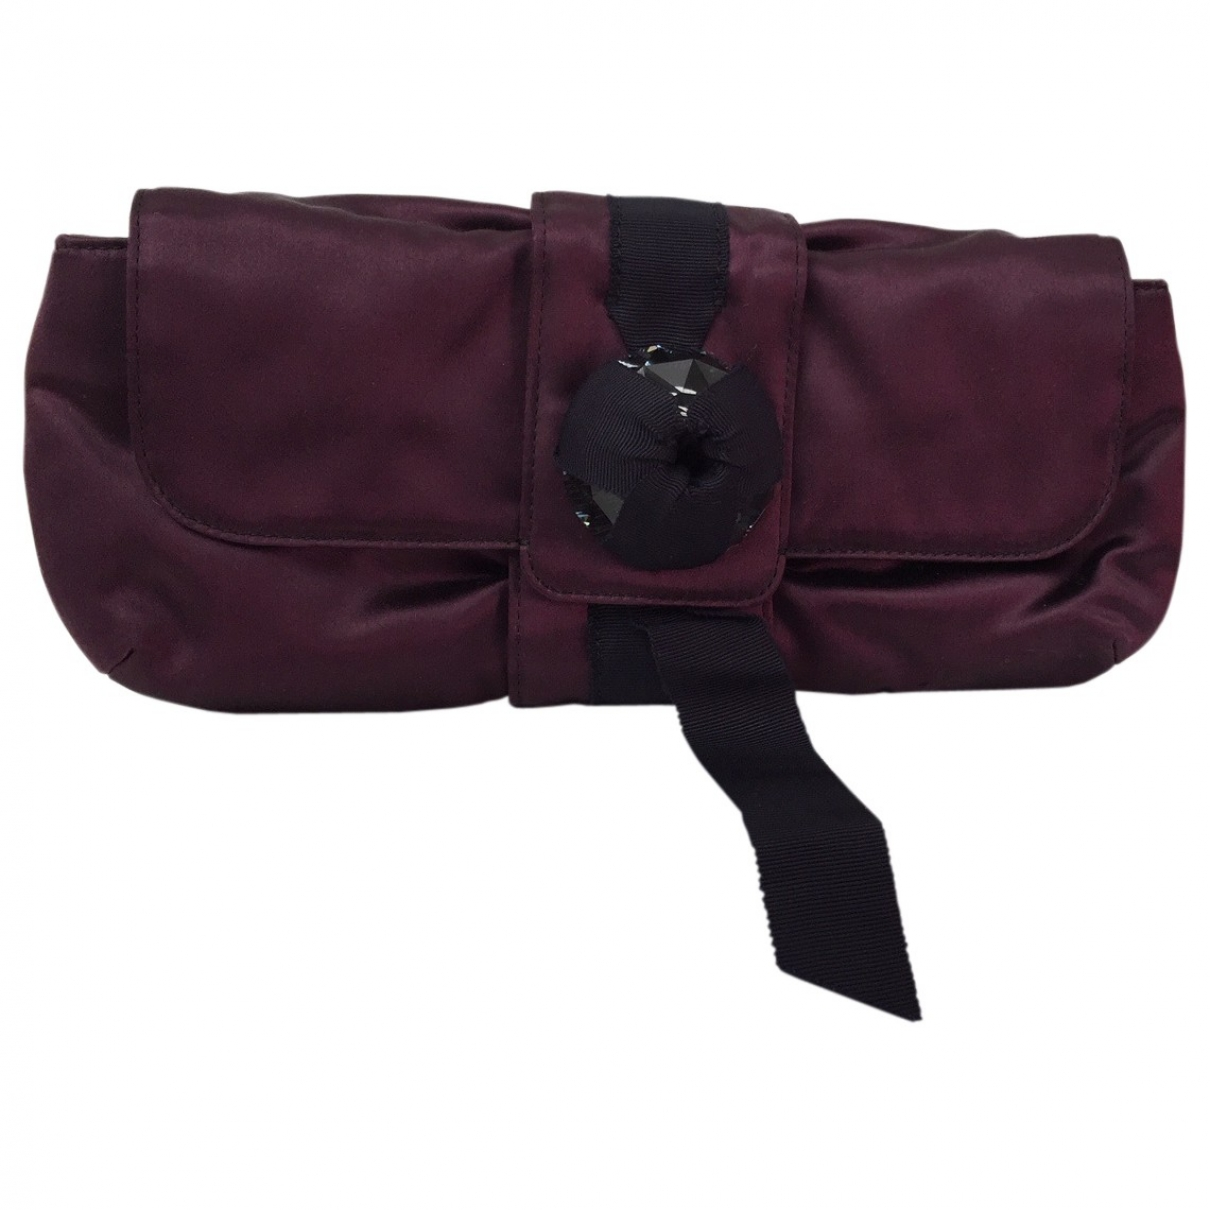 Lanvin \N Silk Clutch bag for Women \N